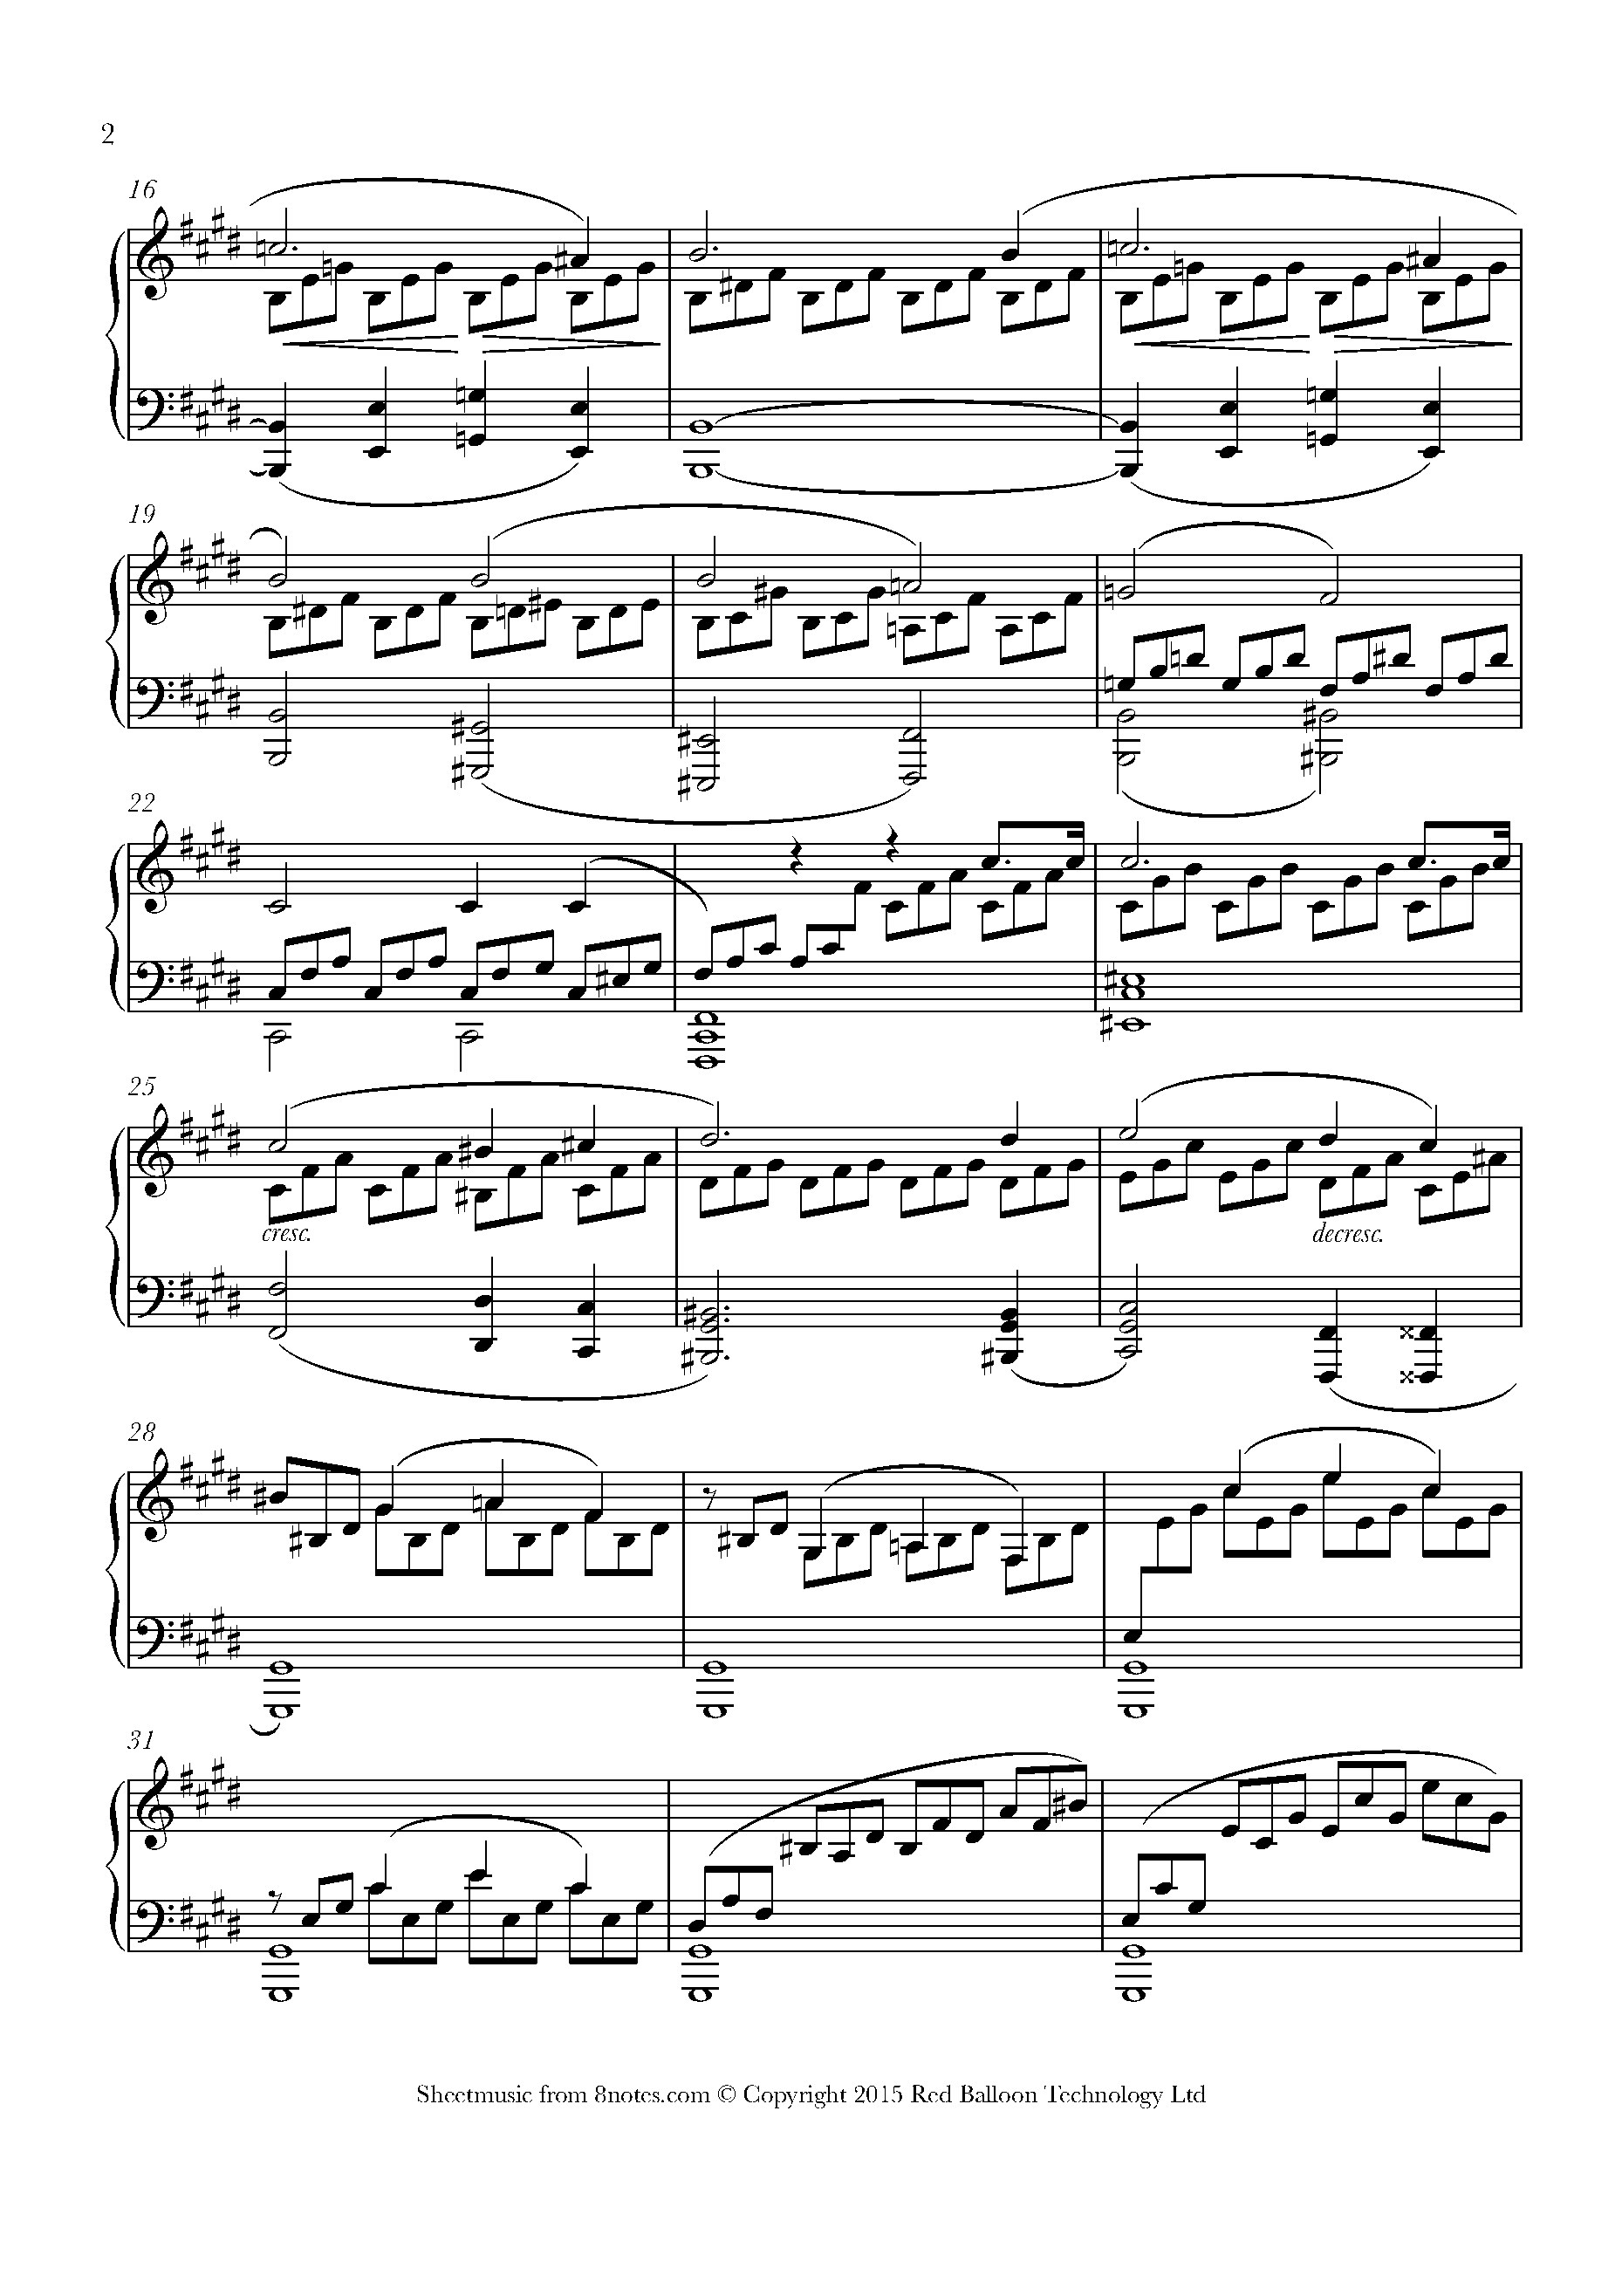 beethoven - moonlight sonata (1st mvt) sheet music for piano - 8notes.com  8notes